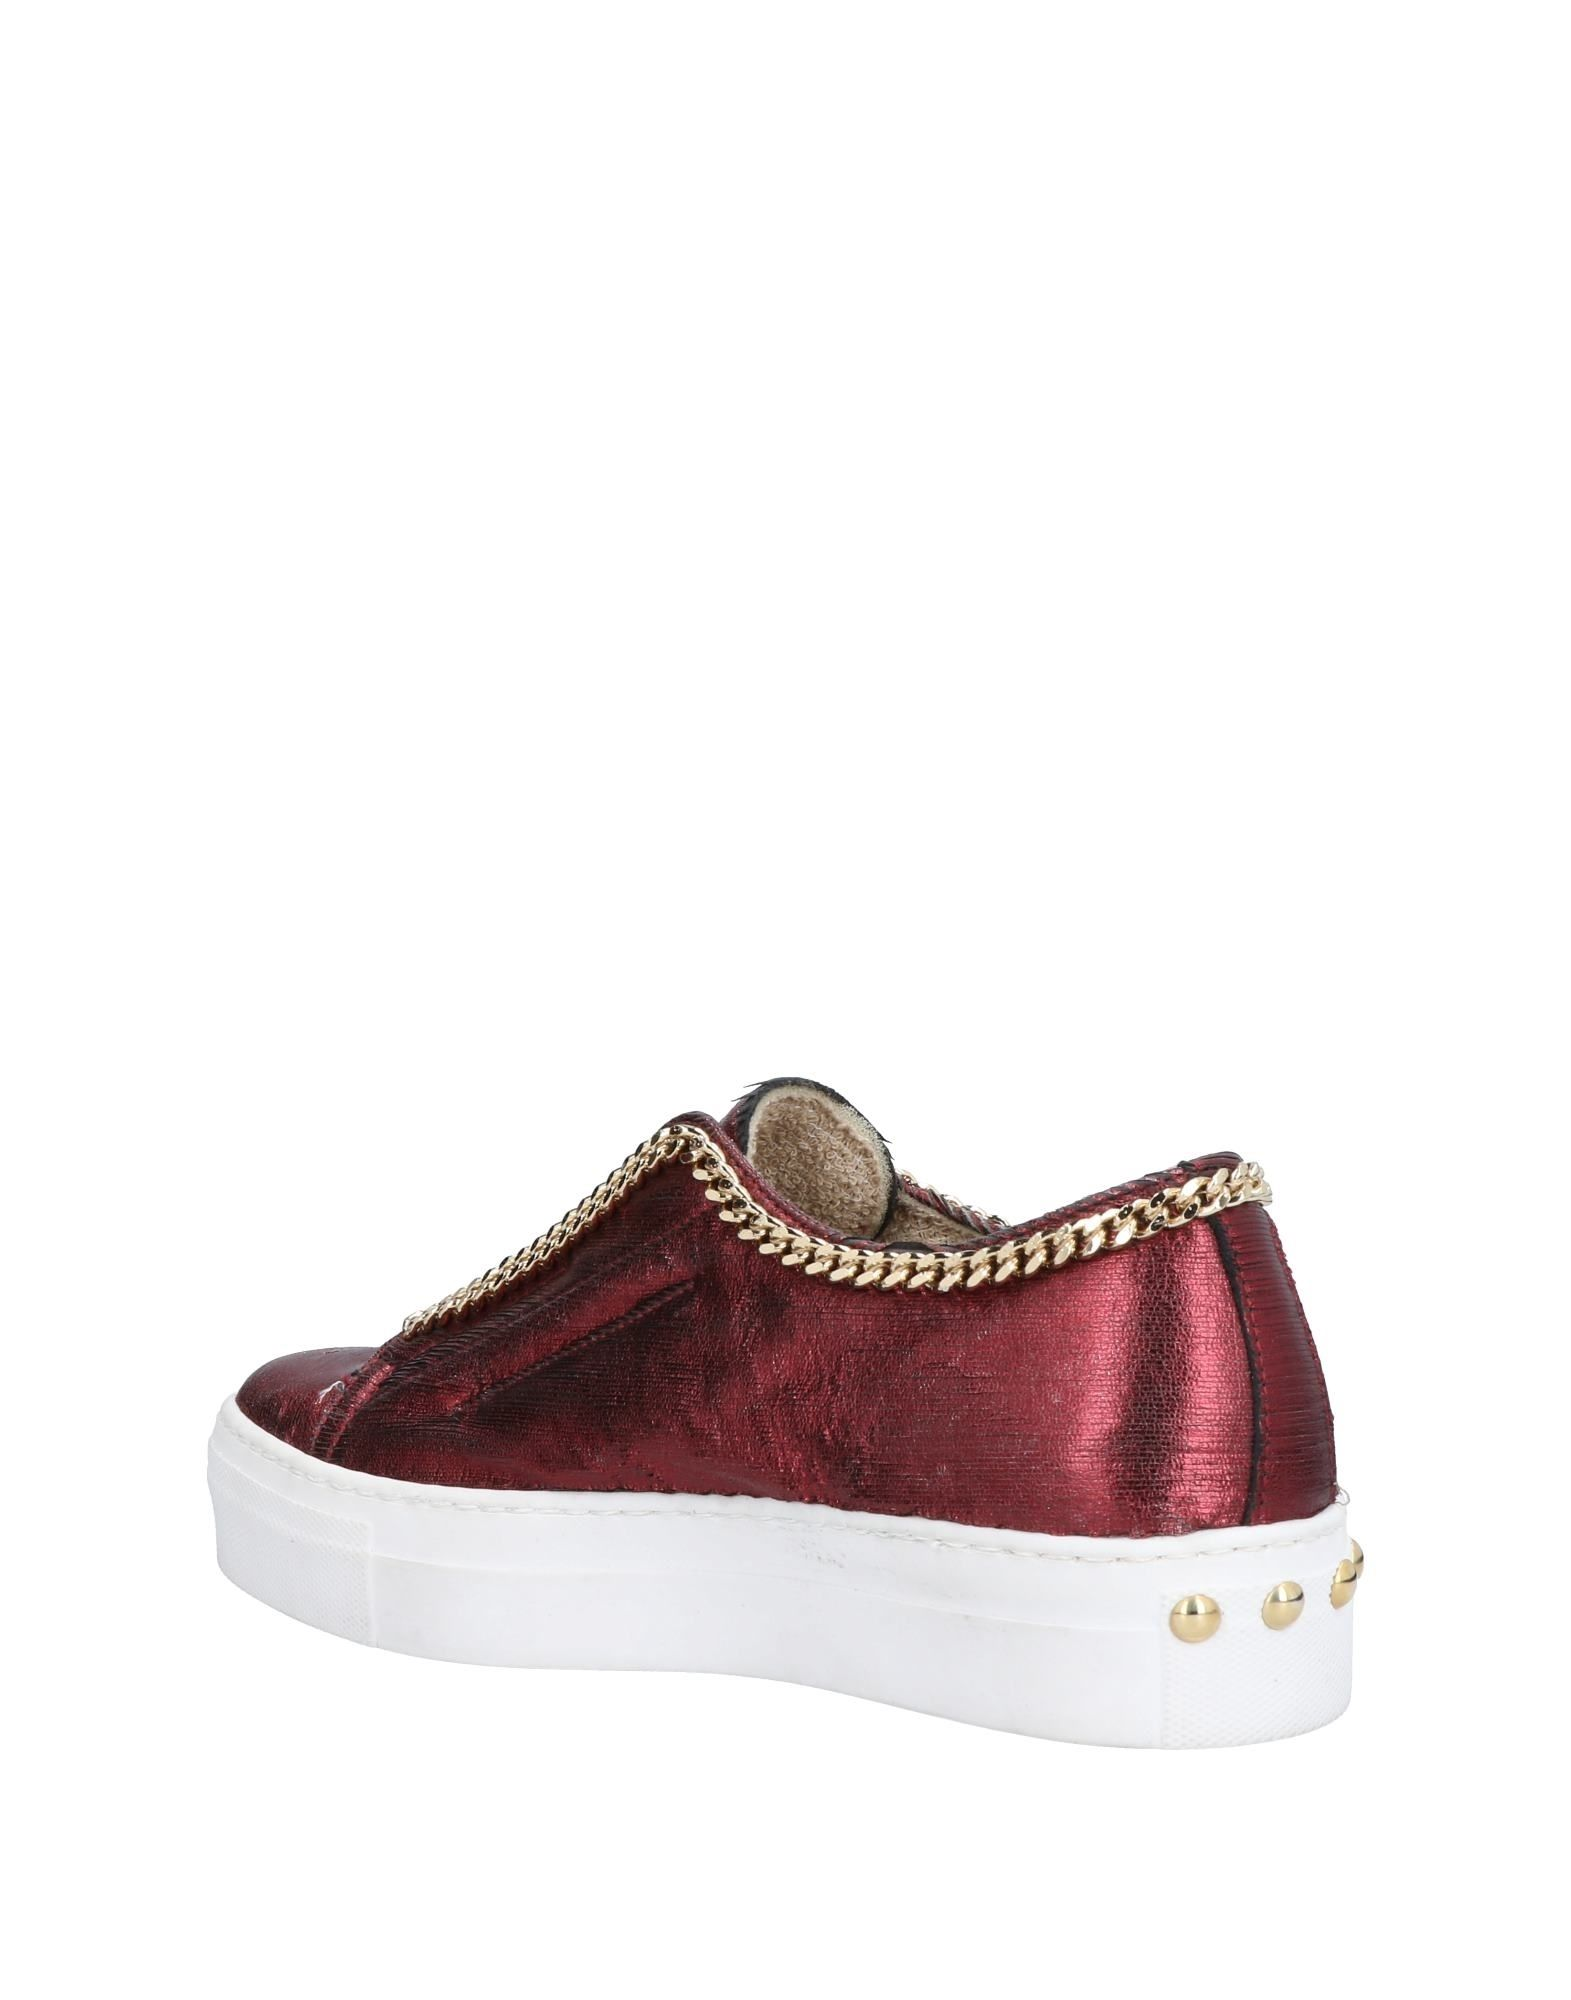 Nila & Nila Sneakers Damen beliebte  11474003JX Gute Qualität beliebte Damen Schuhe f49263